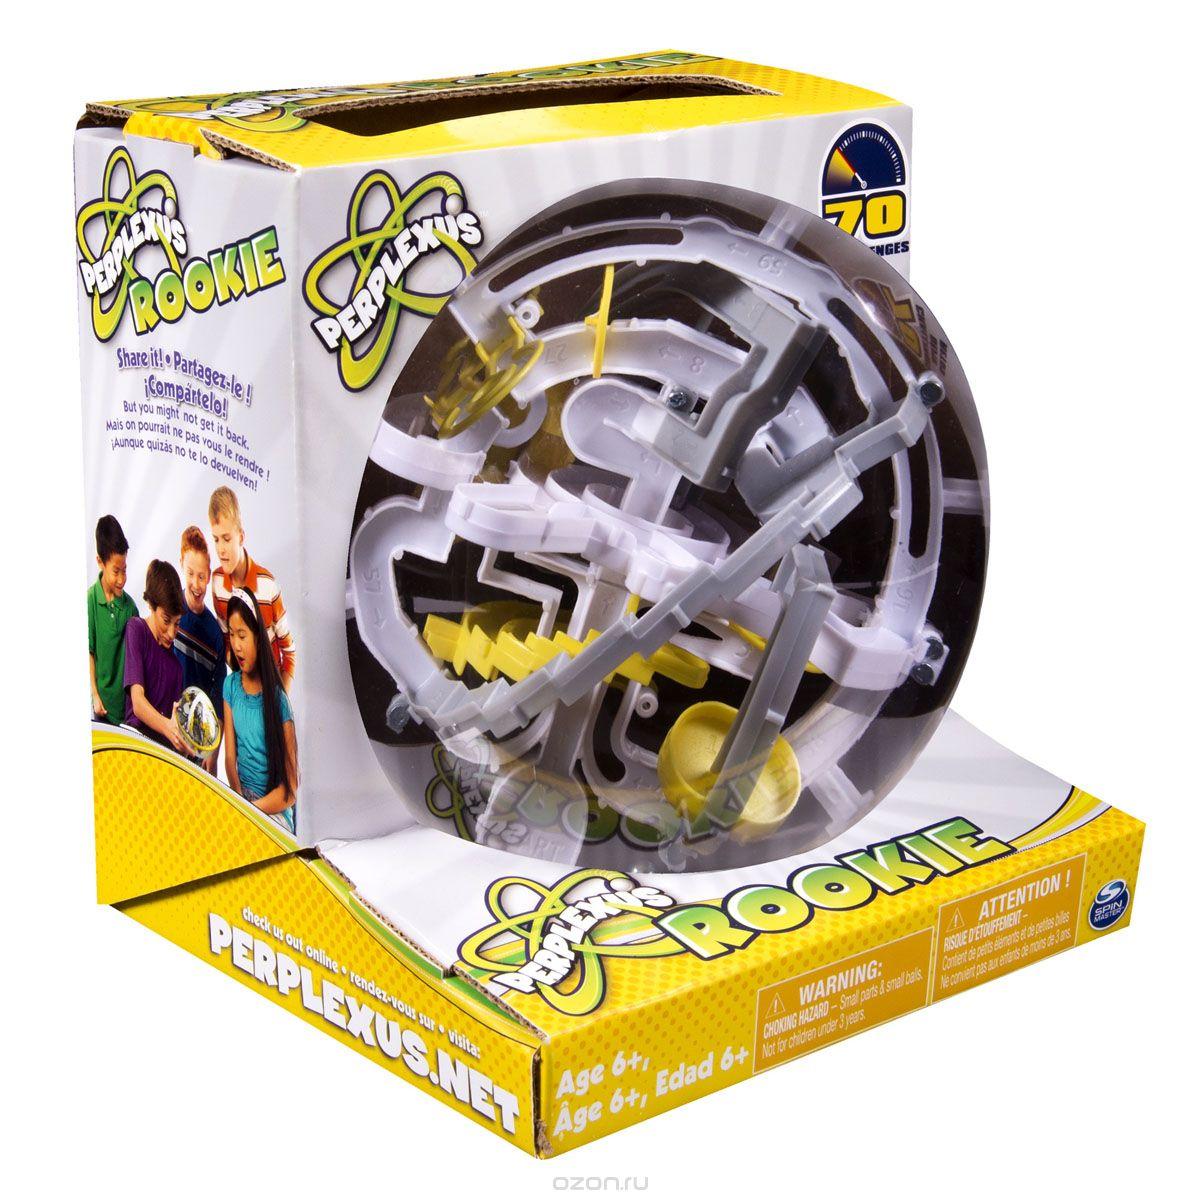 34176 Игра Spin Master головоломка Perplexus Rookie, 70 барьеров